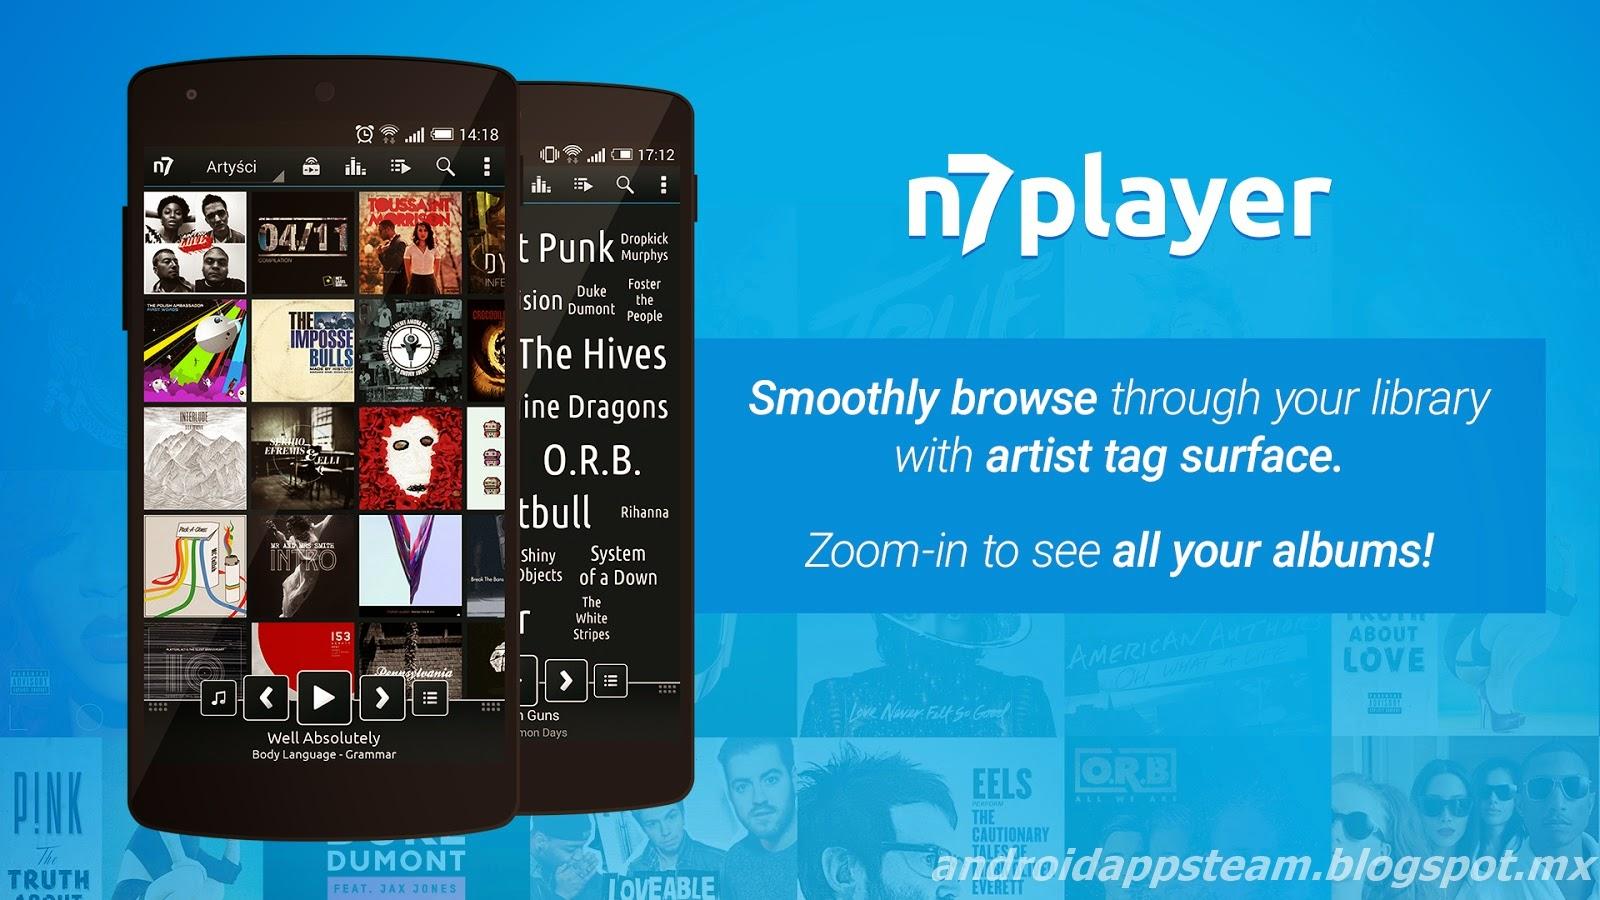 N7player music player unlocker latest version apk | androidappsapk. Co.